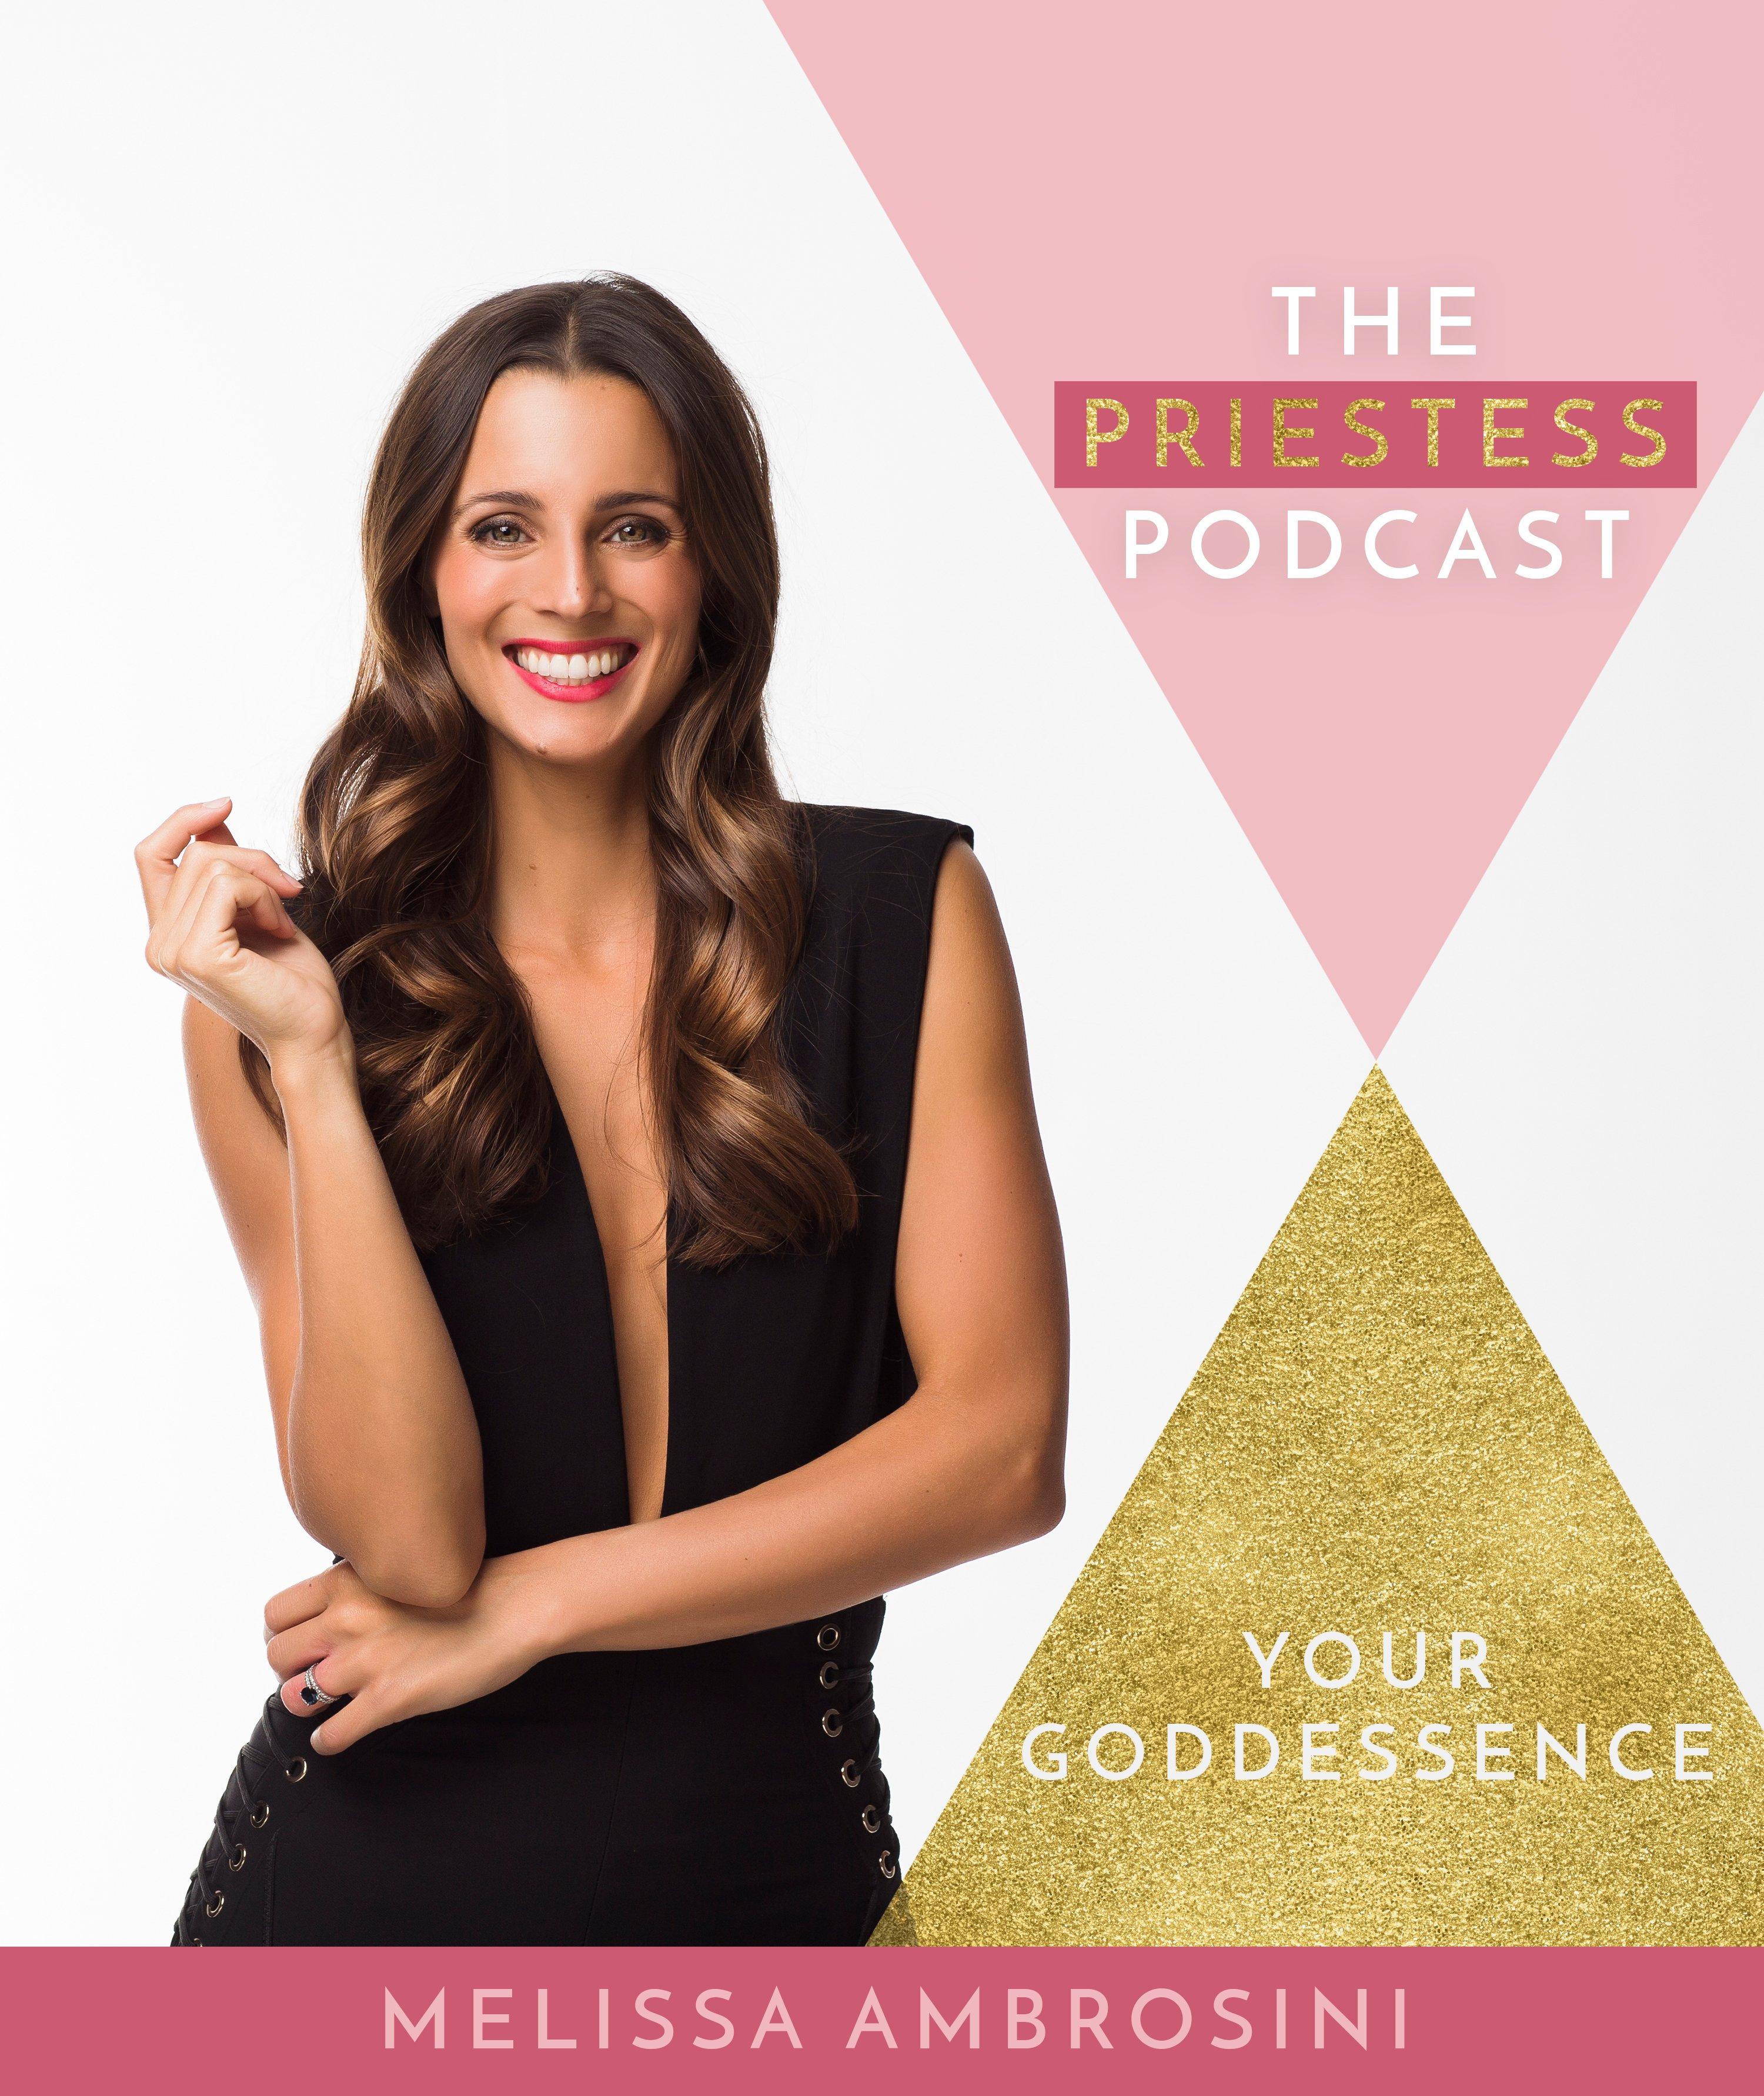 Melissa Ambrosini on Your Goddessence